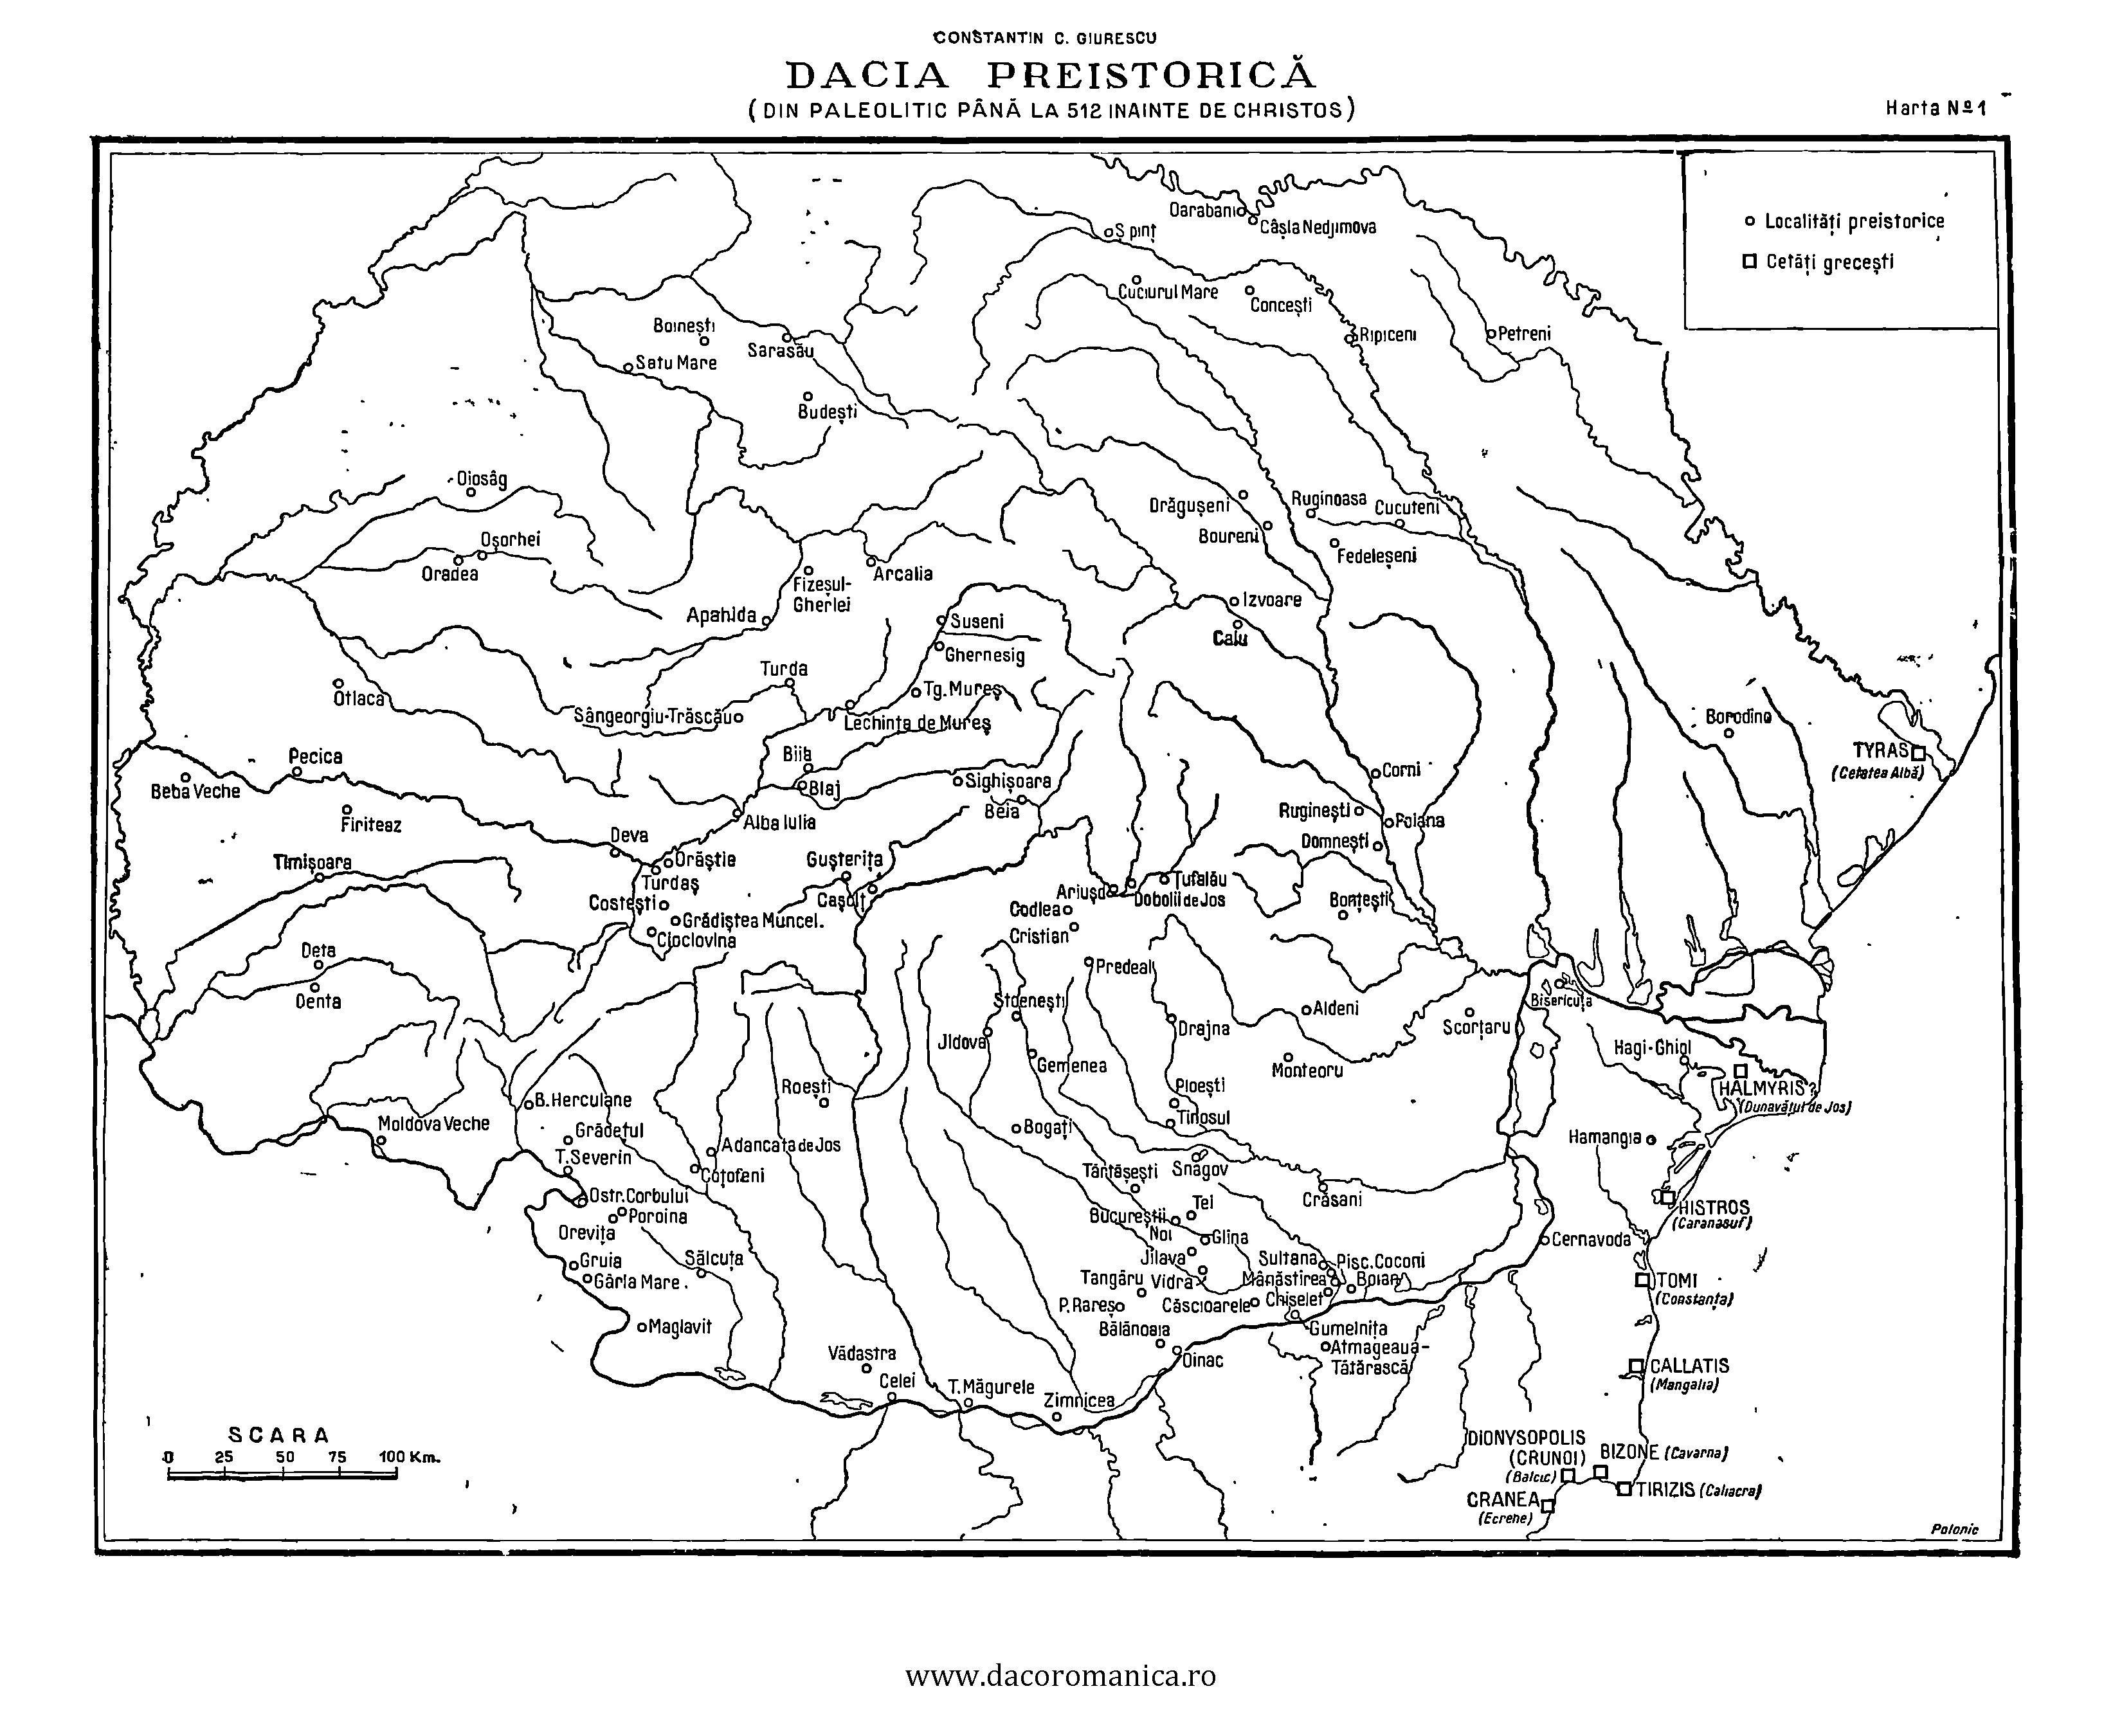 dacia preistorica - giurescu-page-001